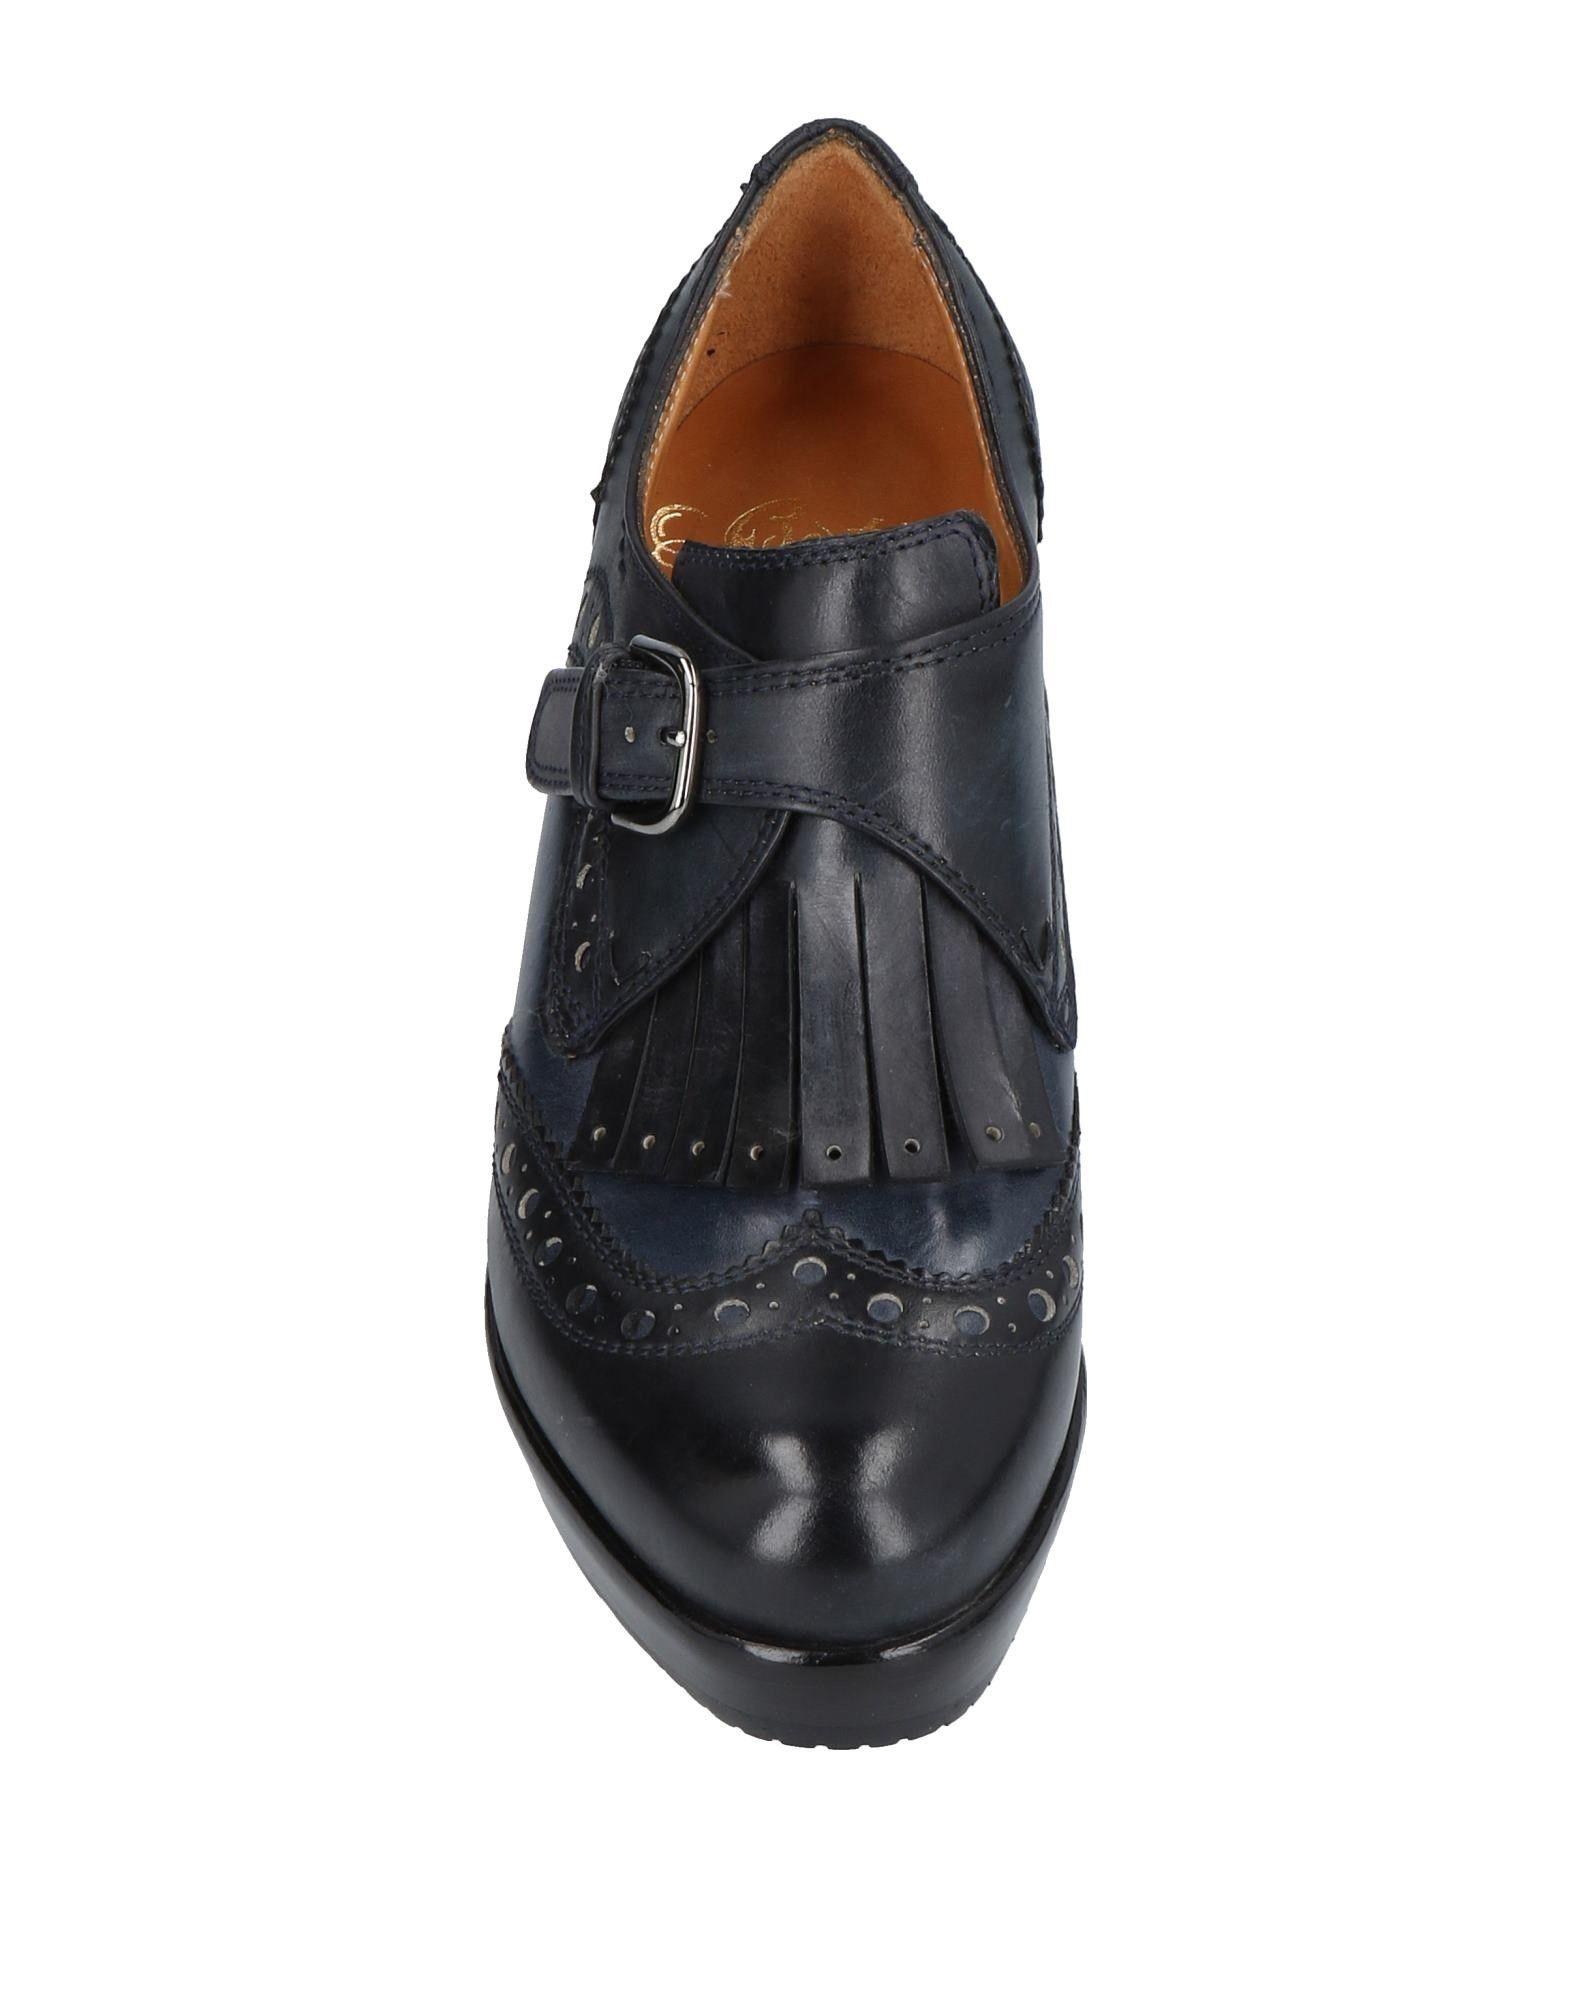 Stilvolle Damen billige Schuhe Botti Mokassins Damen Stilvolle  11464619BC 858e56